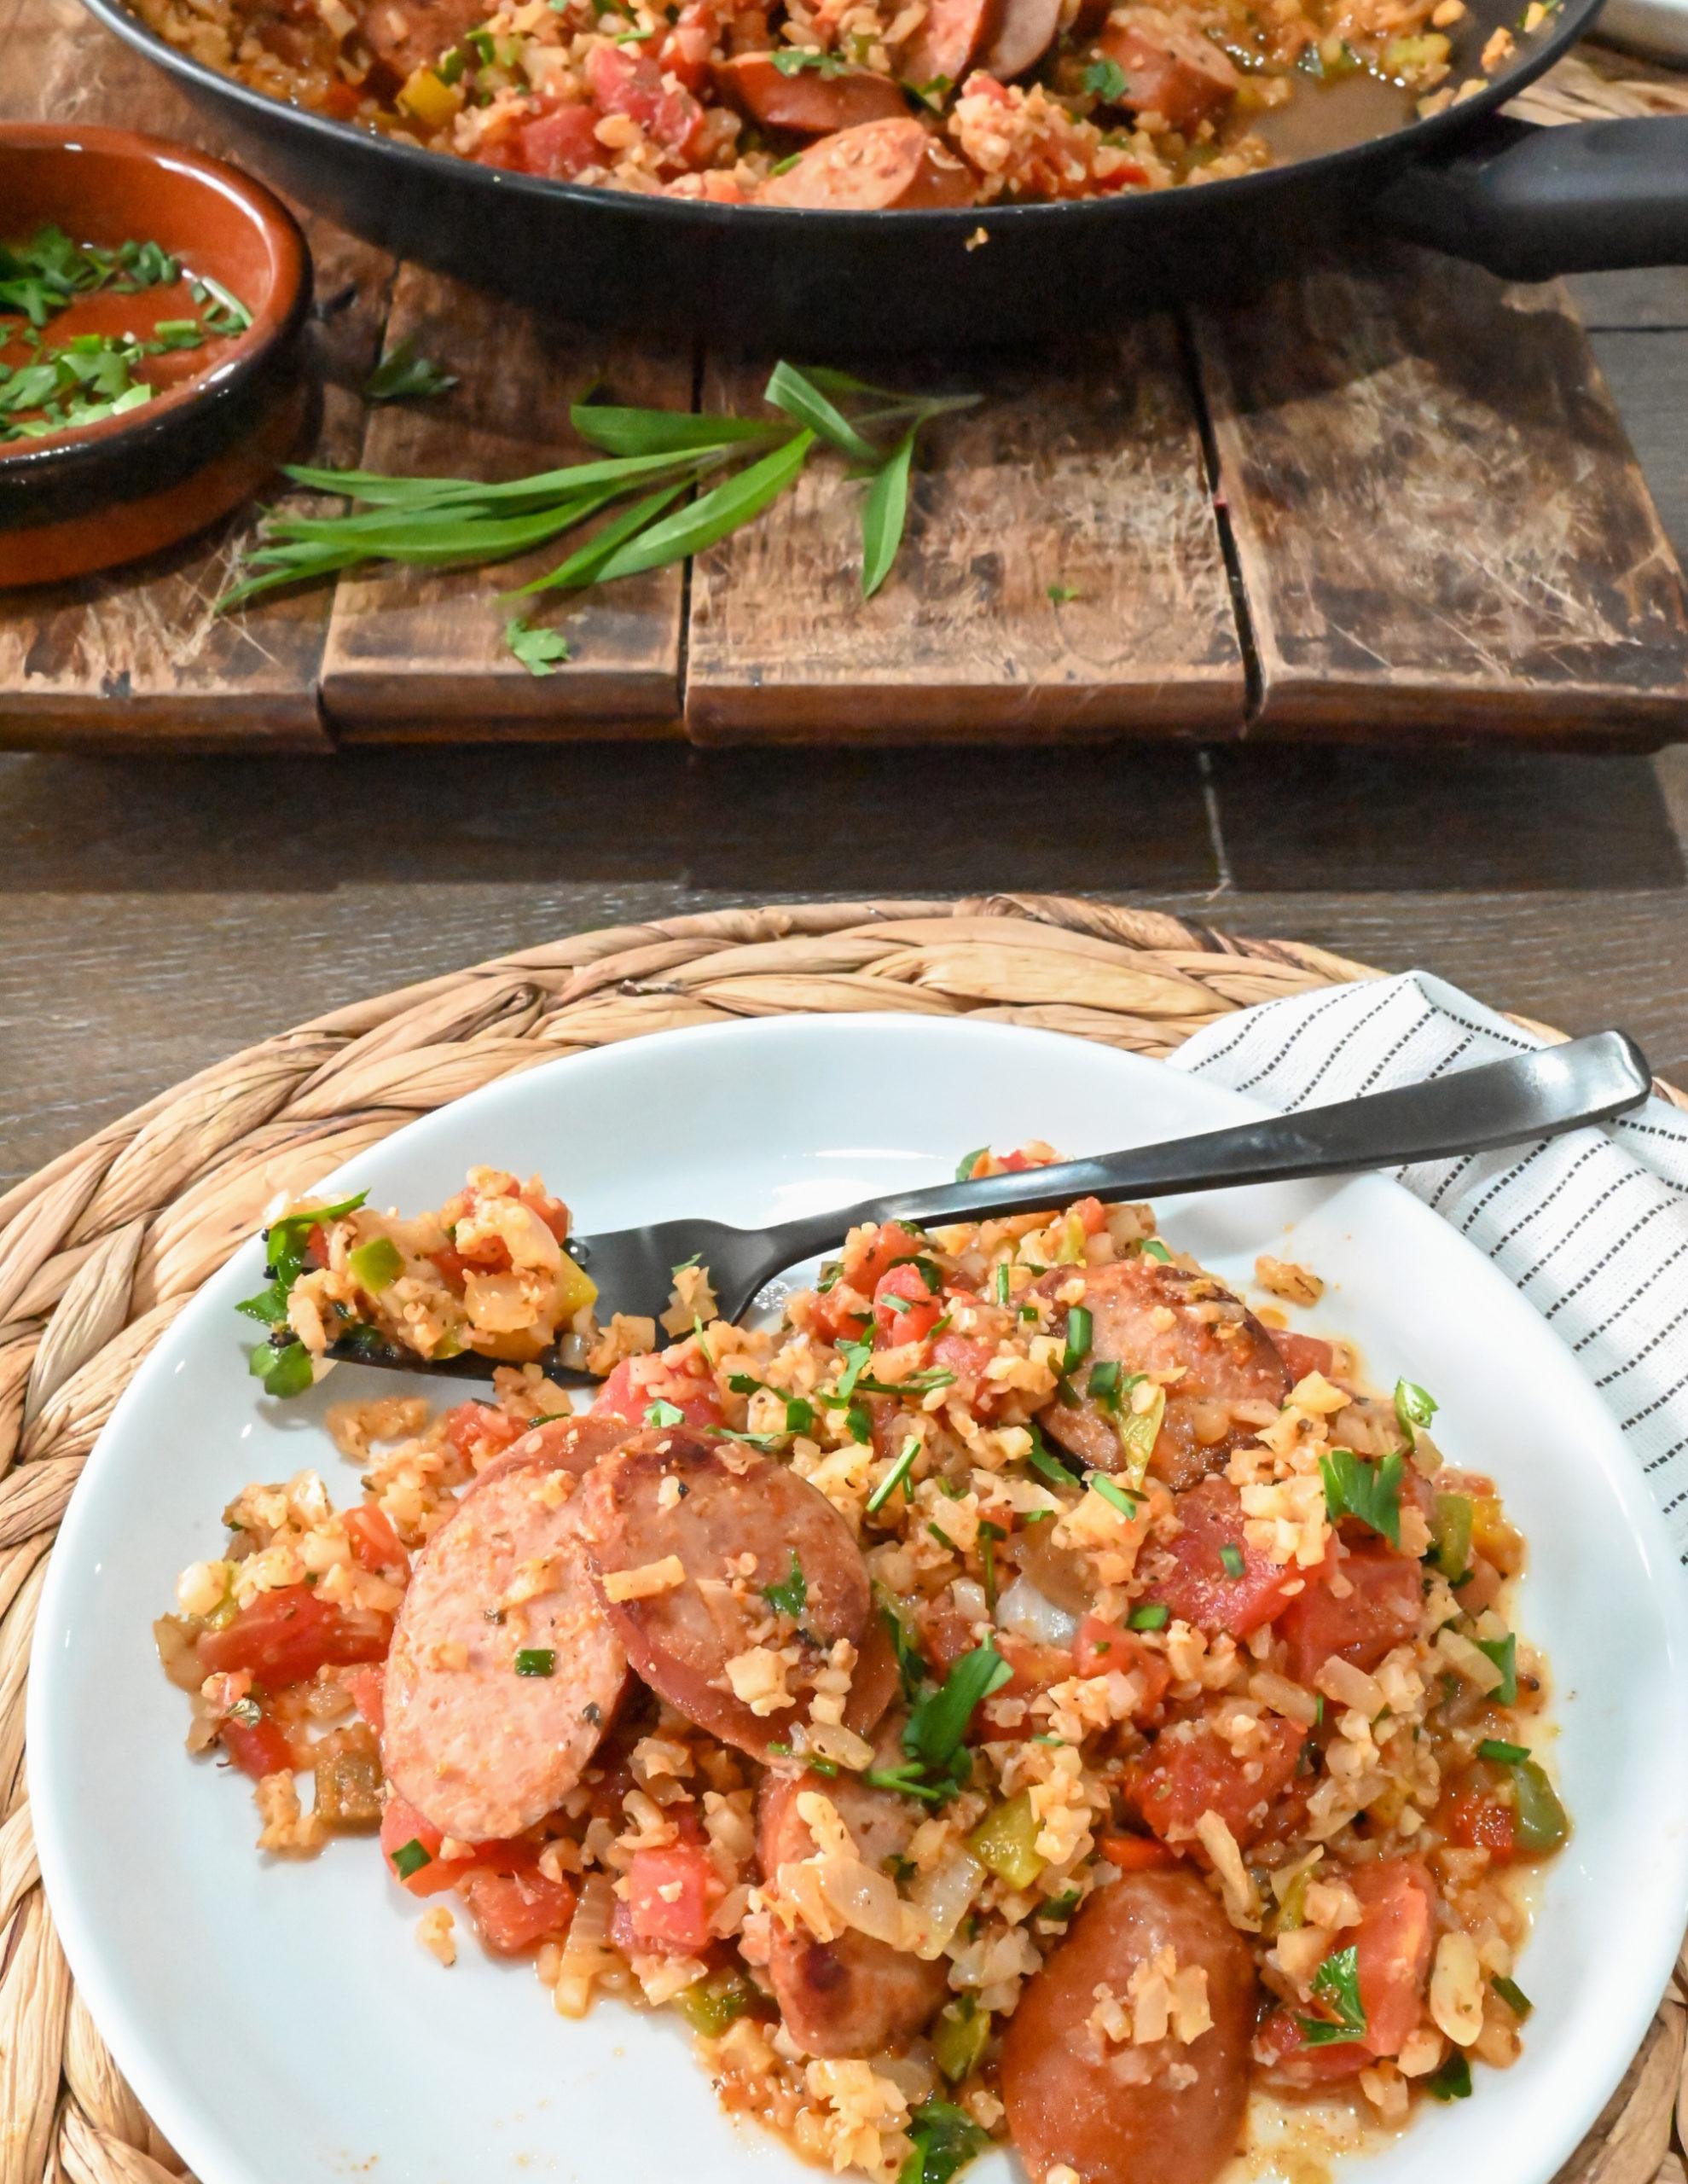 keto Spanish rice and sausage plated